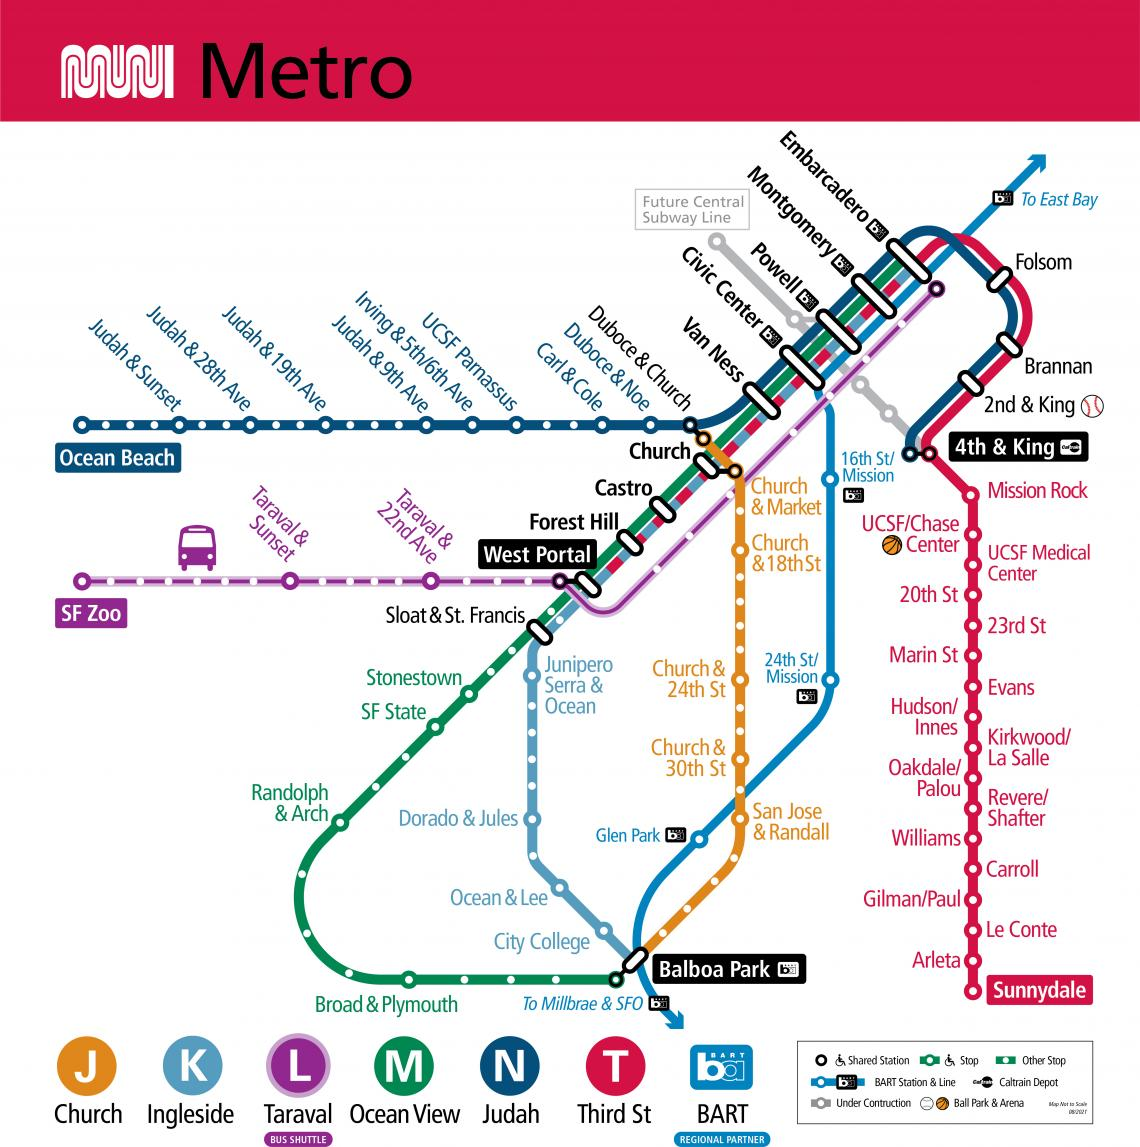 Muni Metro System Map effective August 14, 2021